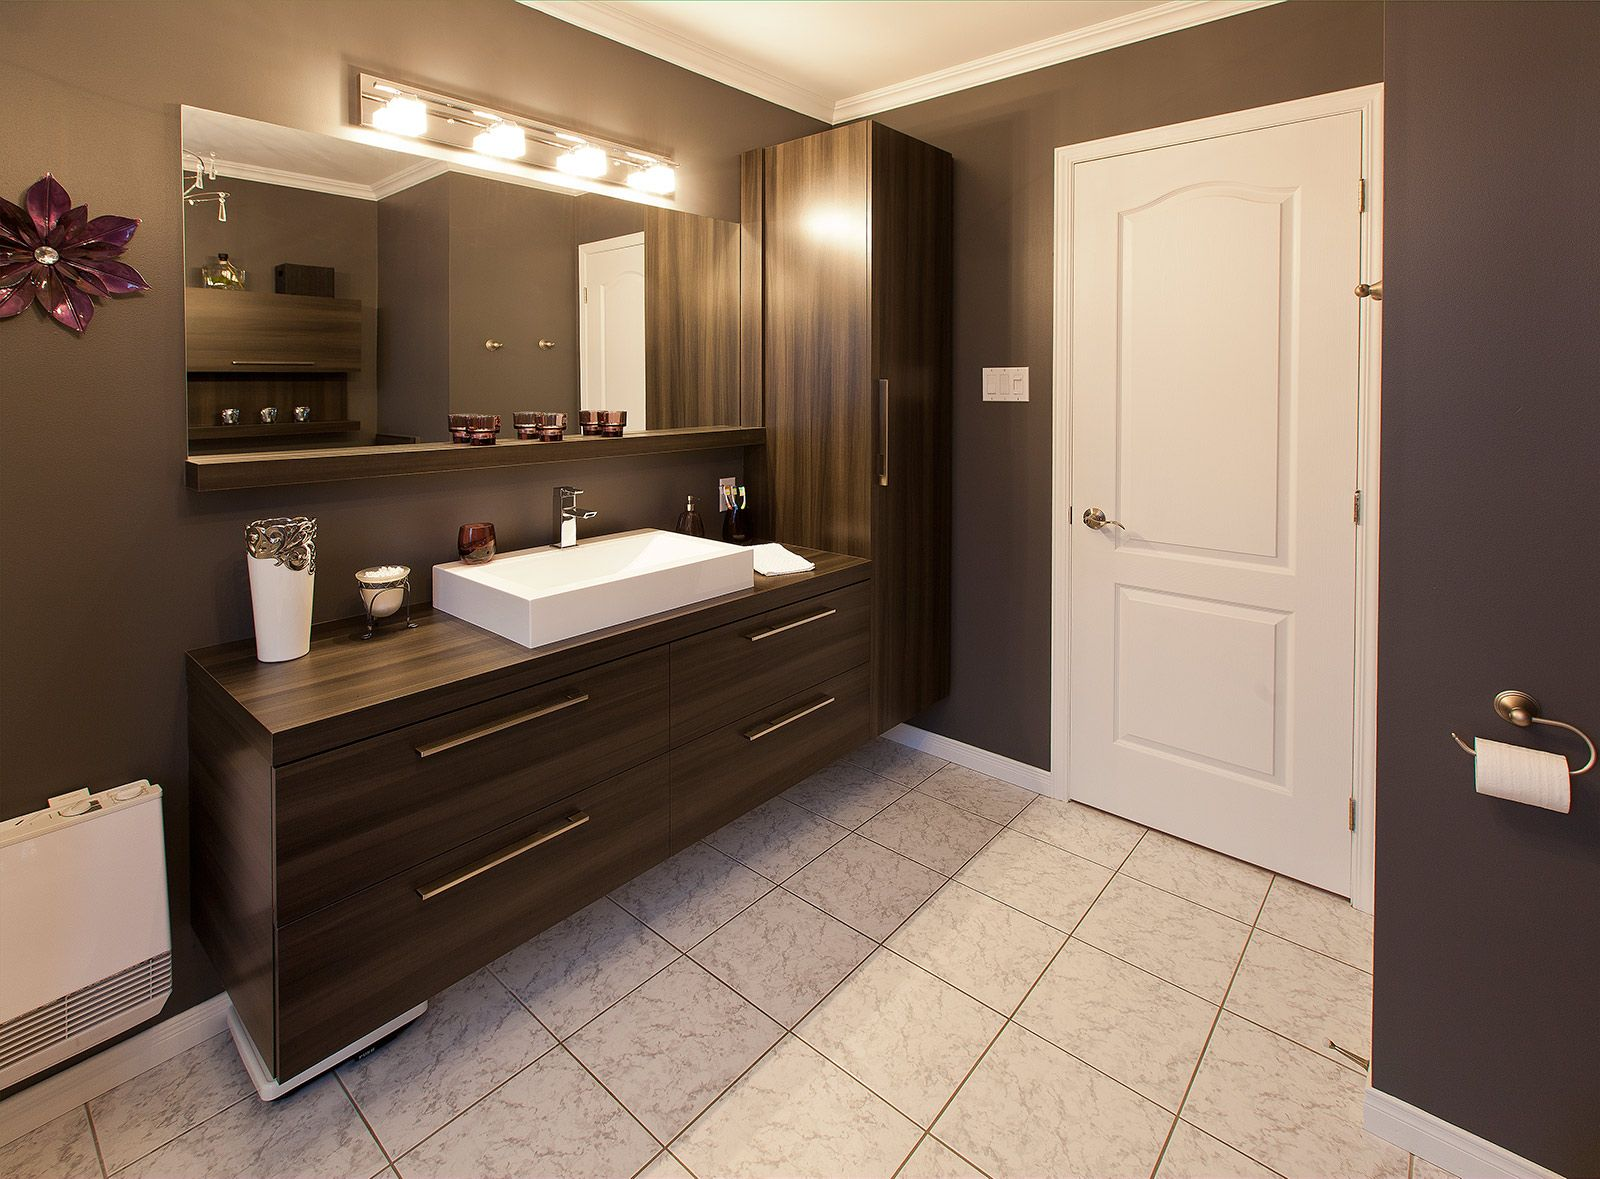 Salle de bain archives griffe cuisine Salle de bain x2o